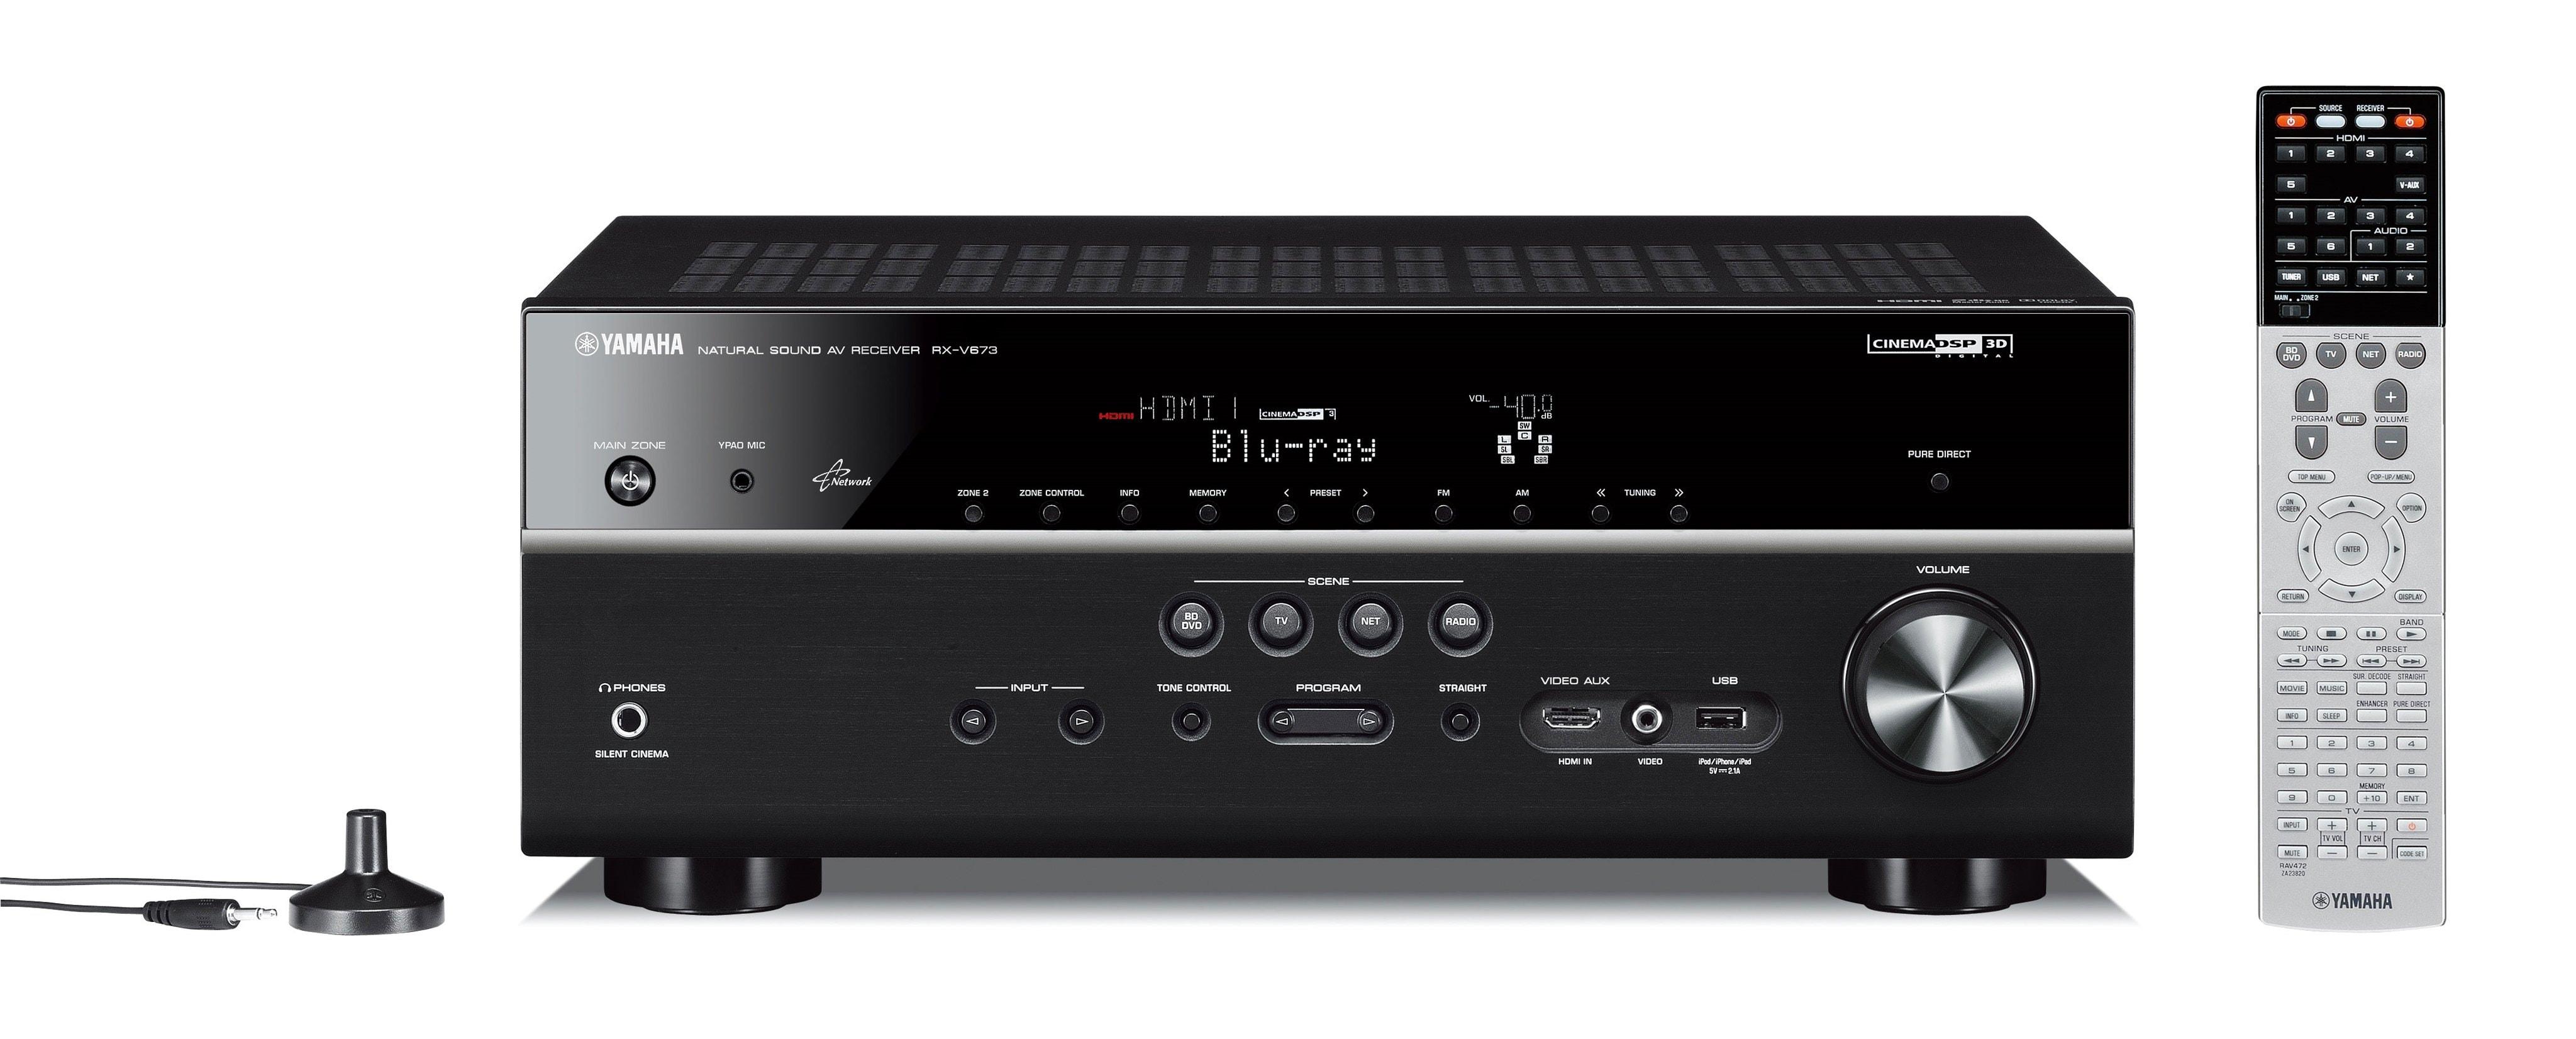 Yamaha rx-a1030 manual audio video receiver hifi engine.